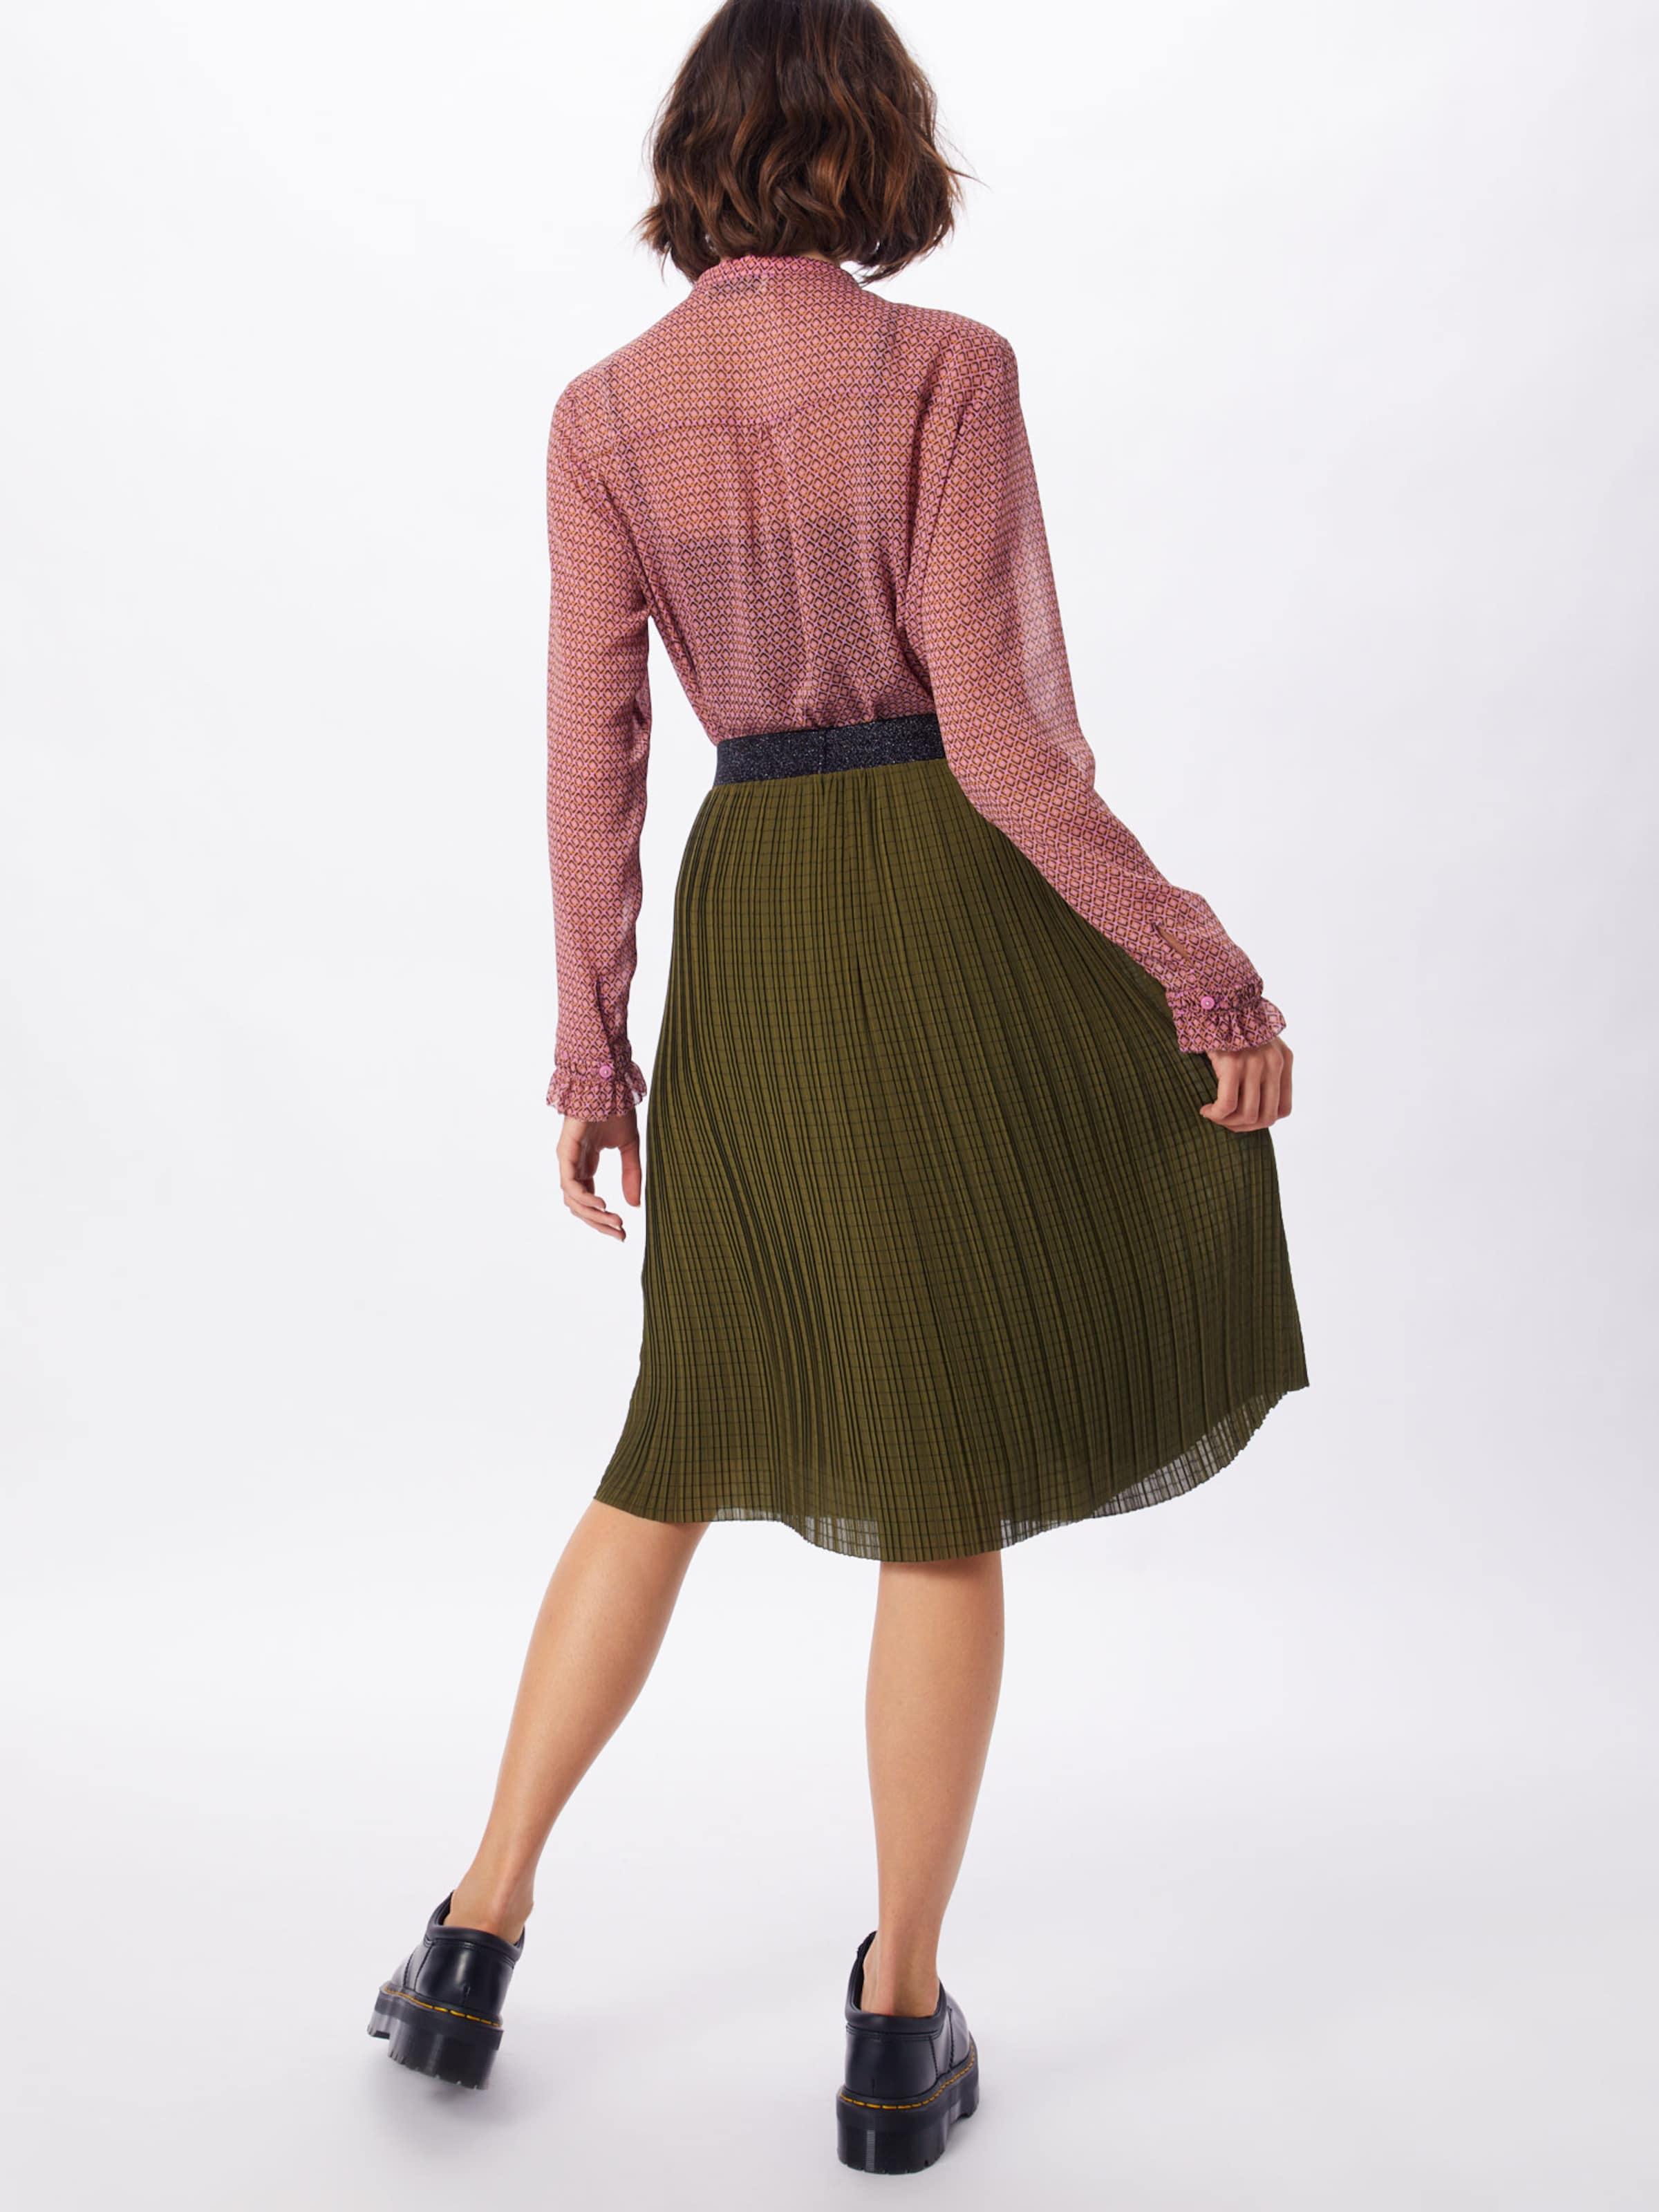 'emmerlie Cecilie' Foncé Vert Bruuns En Bazaar Jupe f7vIYb6gy